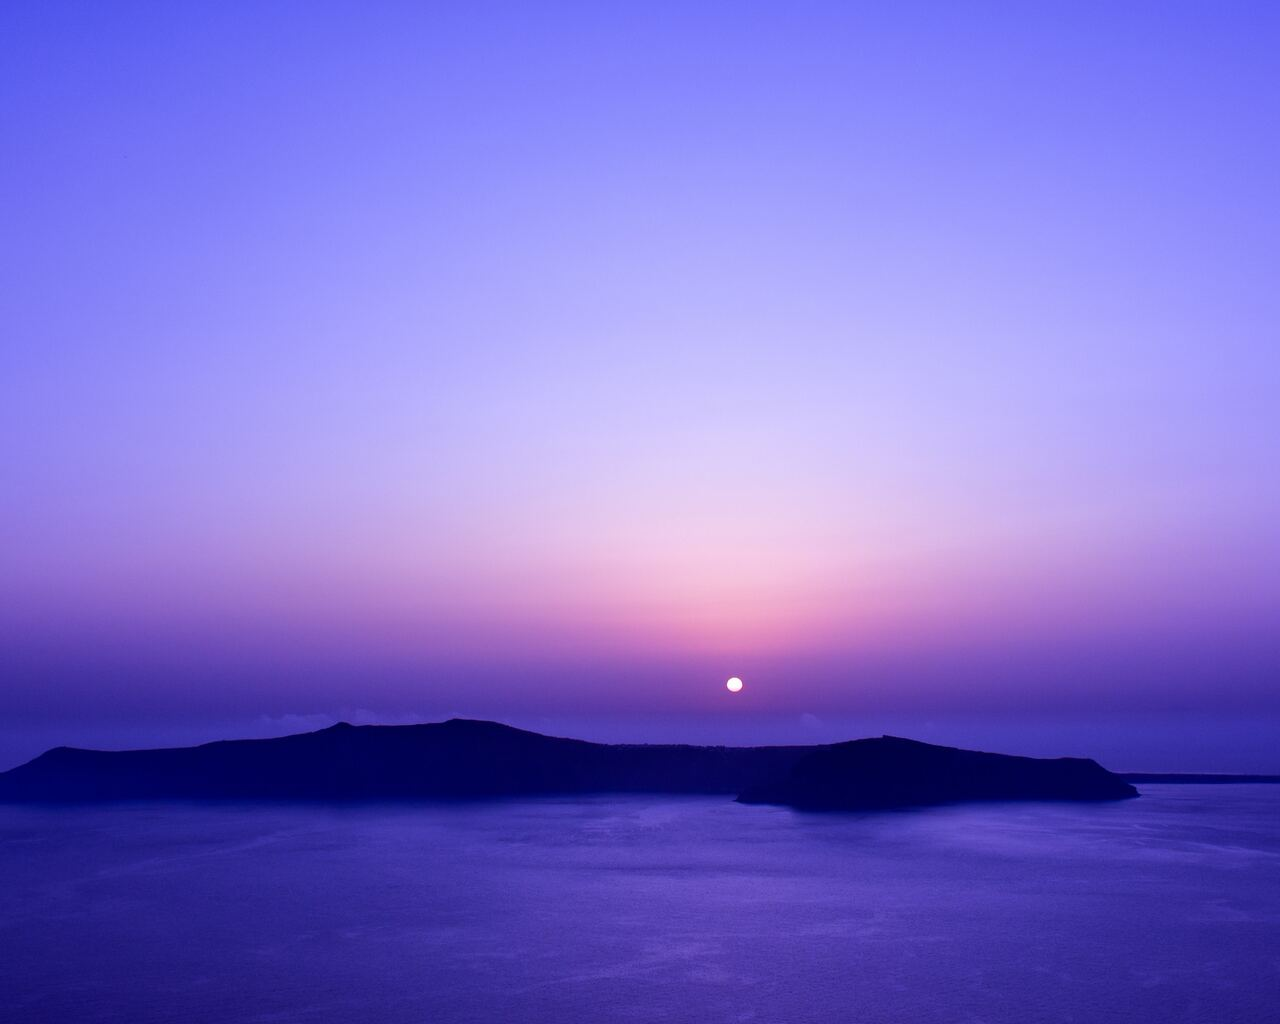 1280x1024 Cool Blue Temperature Sunset 1280x1024 Resolution Hd 4k